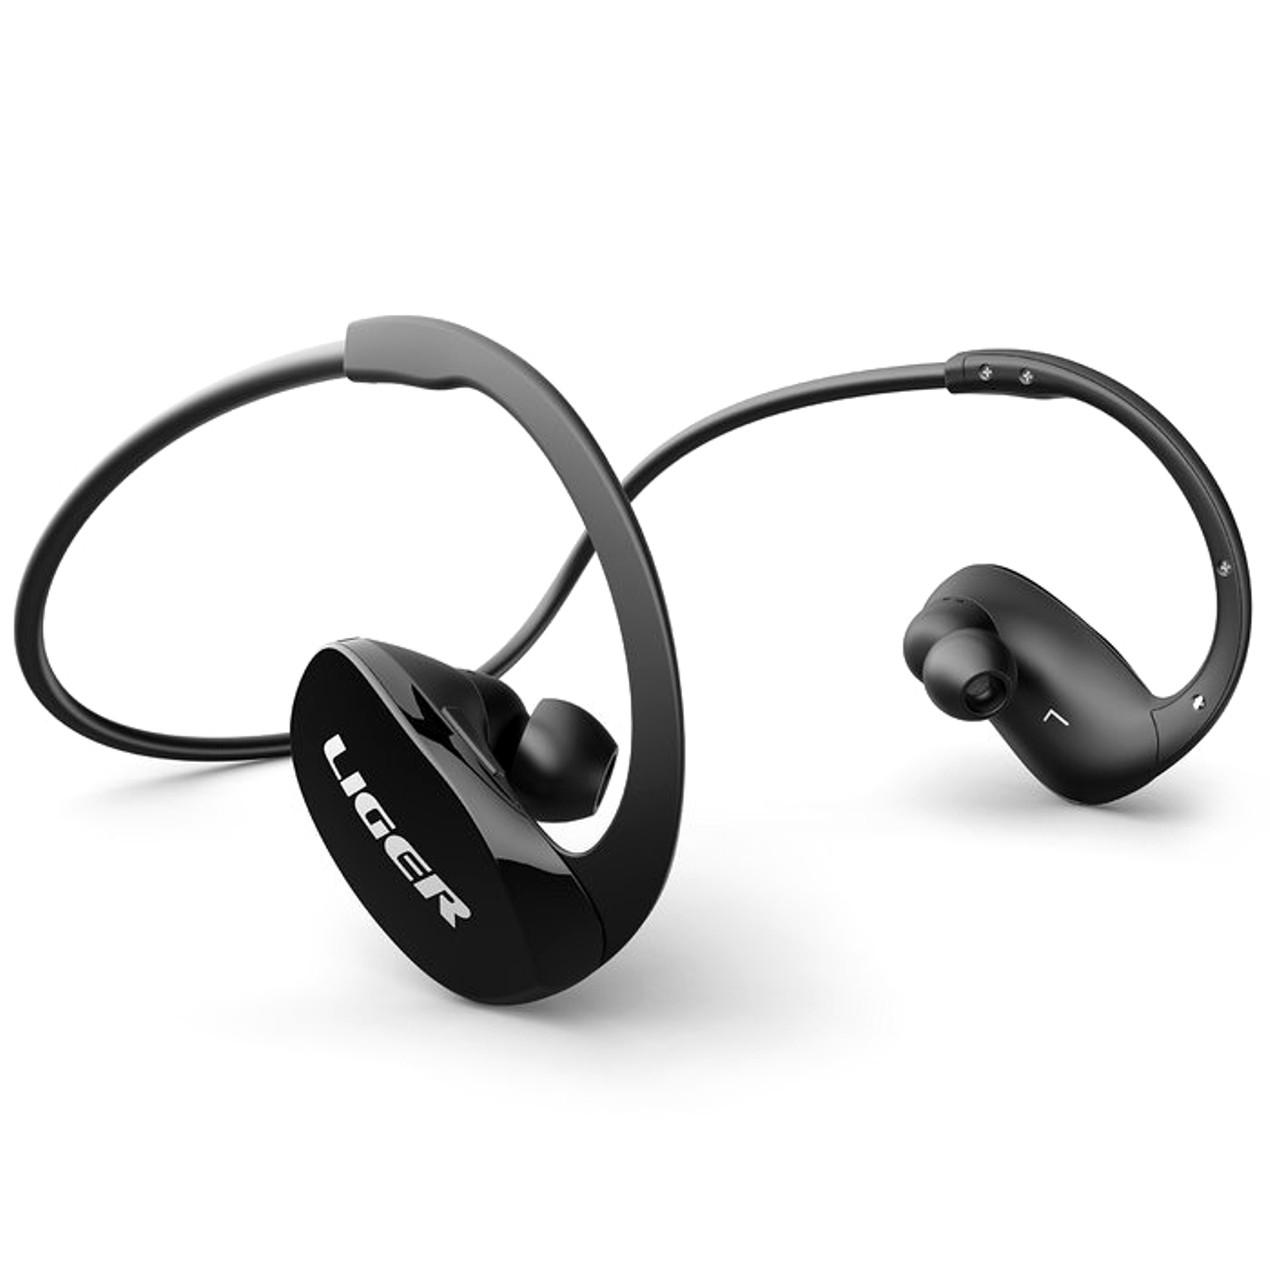 85d010e9466 Liger XS900 Wireless Bluetooth 4.1 Headphones Noise Cancelling Headphones  ...